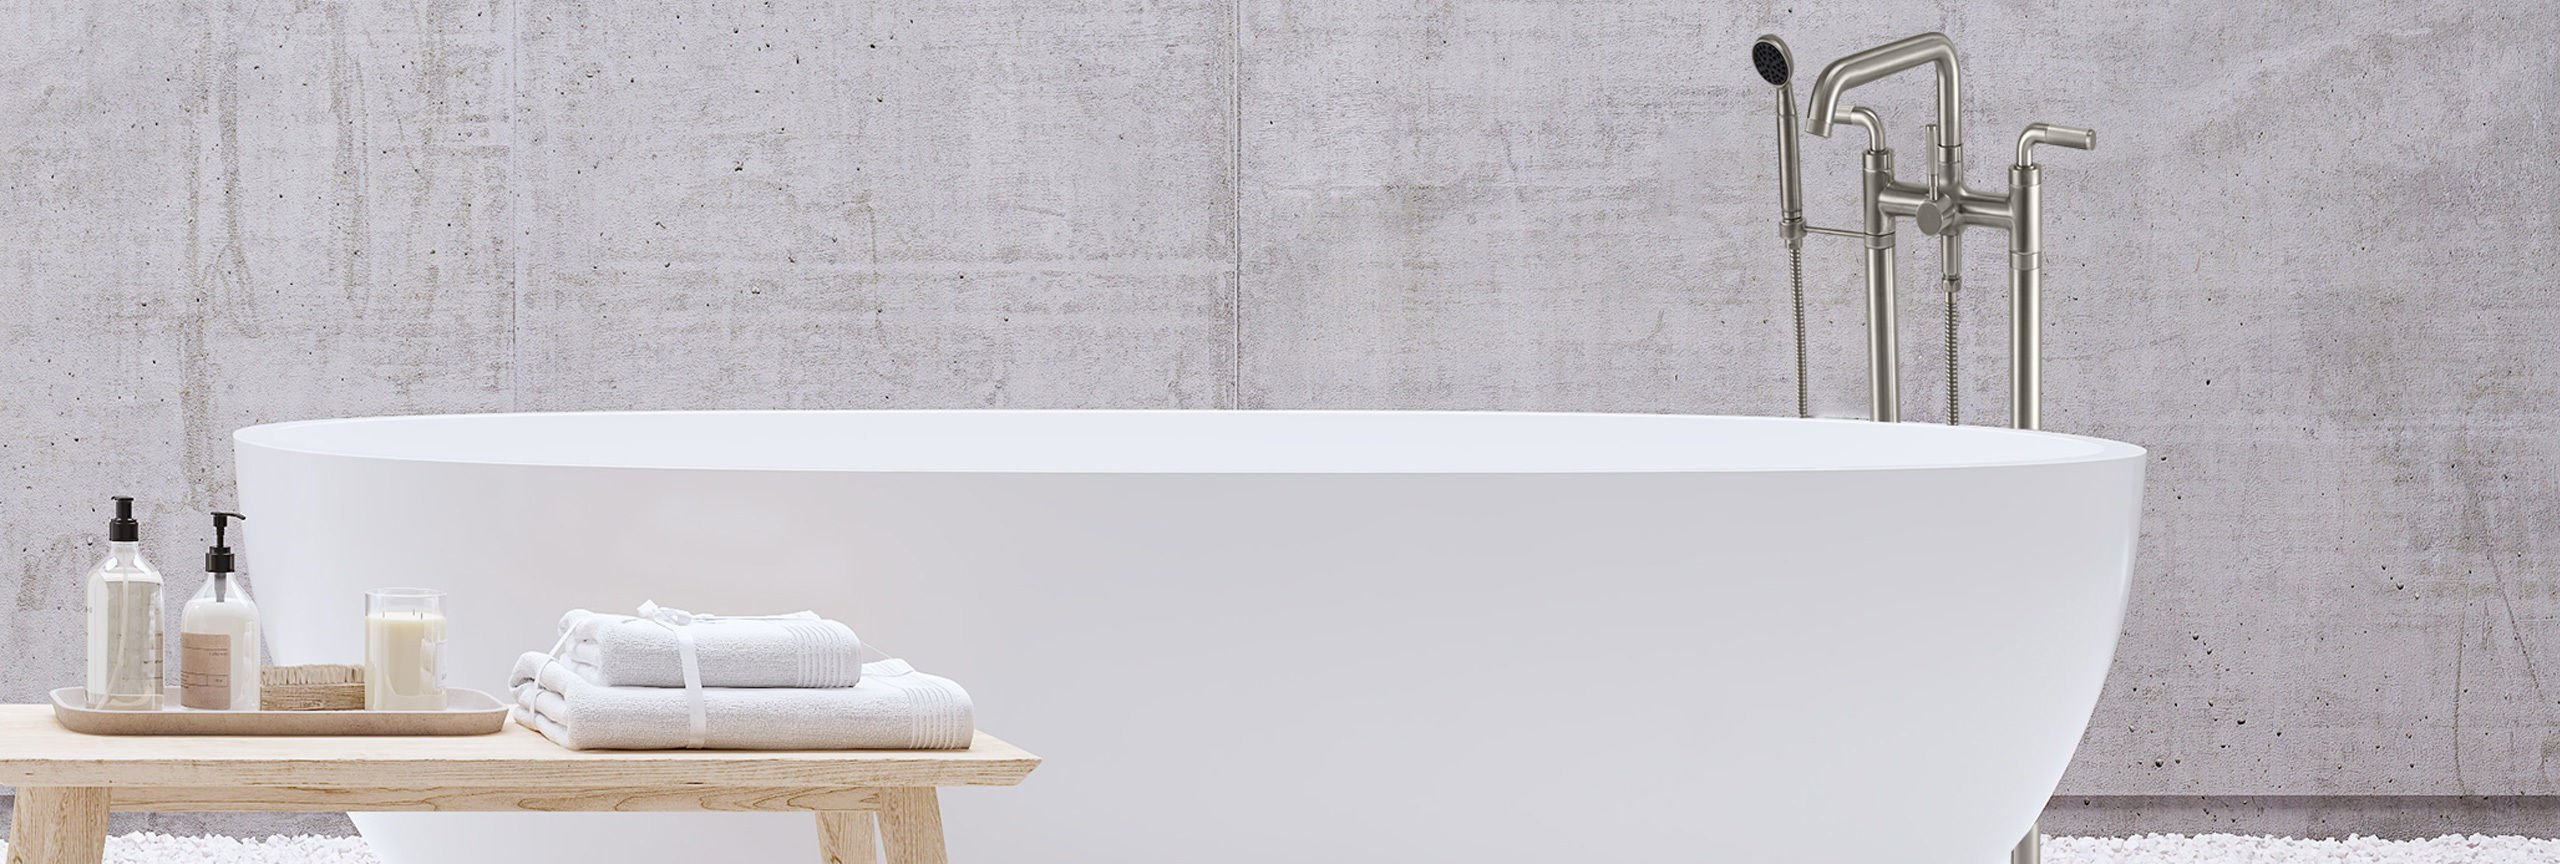 Descanso floor mount tub filler next to large white tub